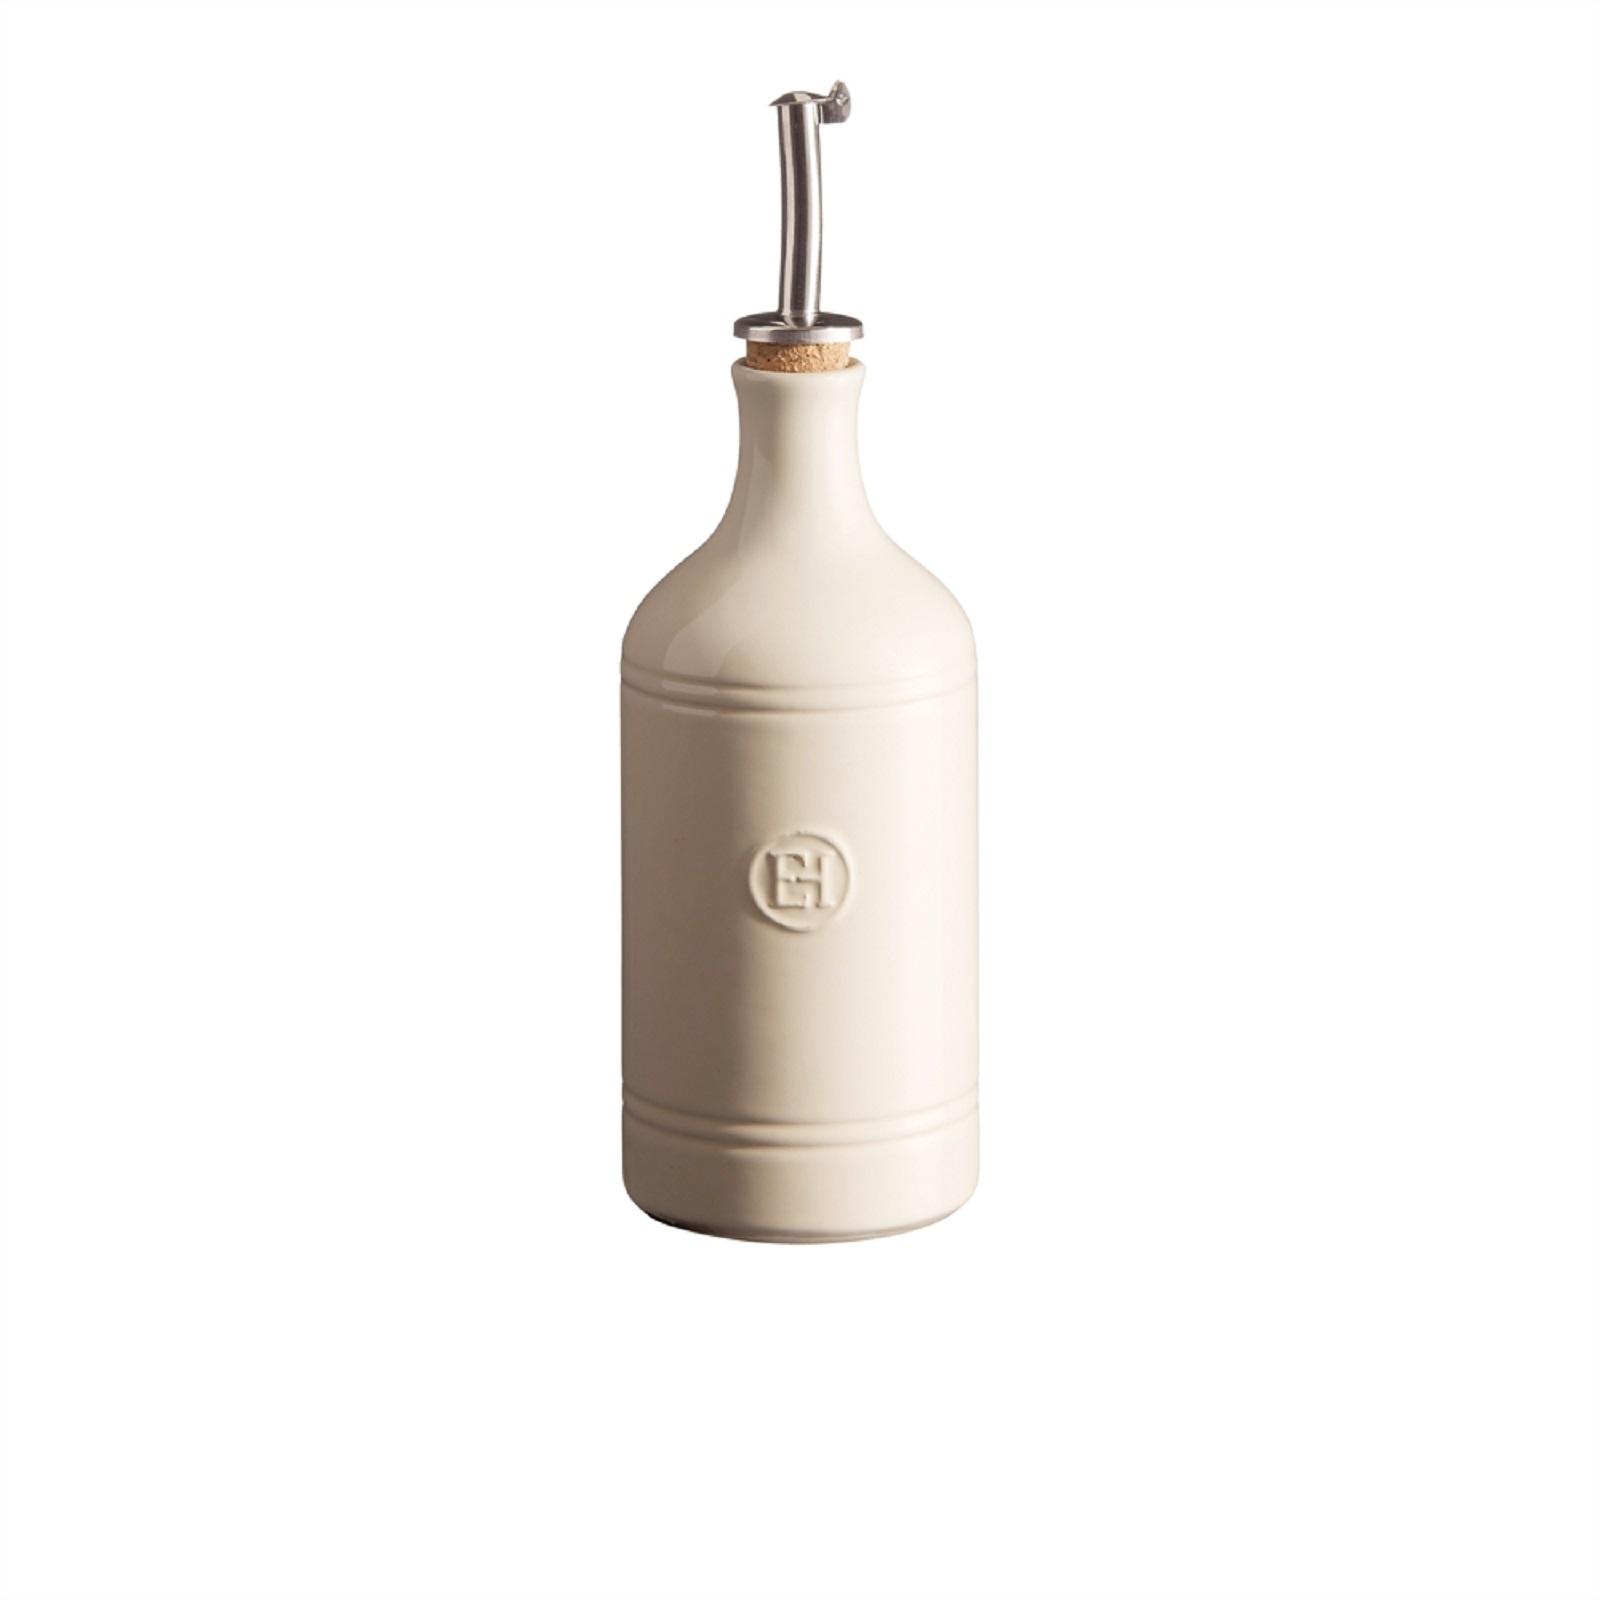 Онлайн каталог PROMENU: Бутылка для масла/уксуса Emile Henry, объем 0,45 л, светло-бежевый Emile Henry 020215